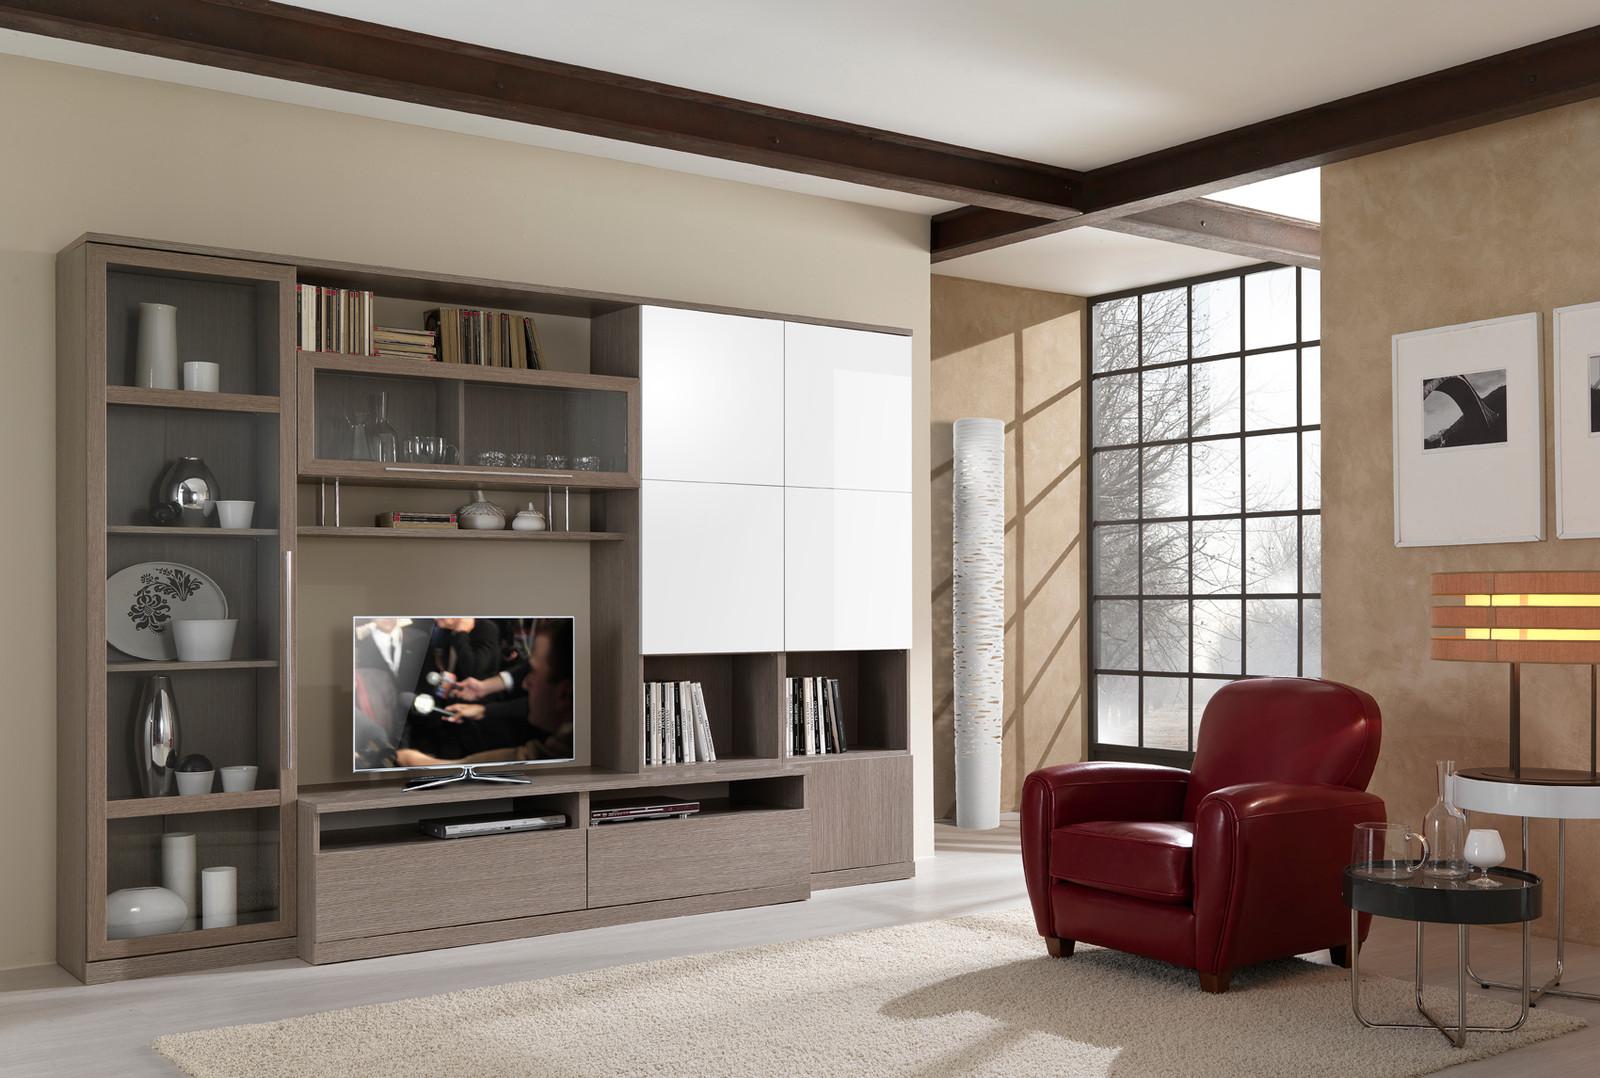 Home Style Gozo Modern Classic Furniture In Malta